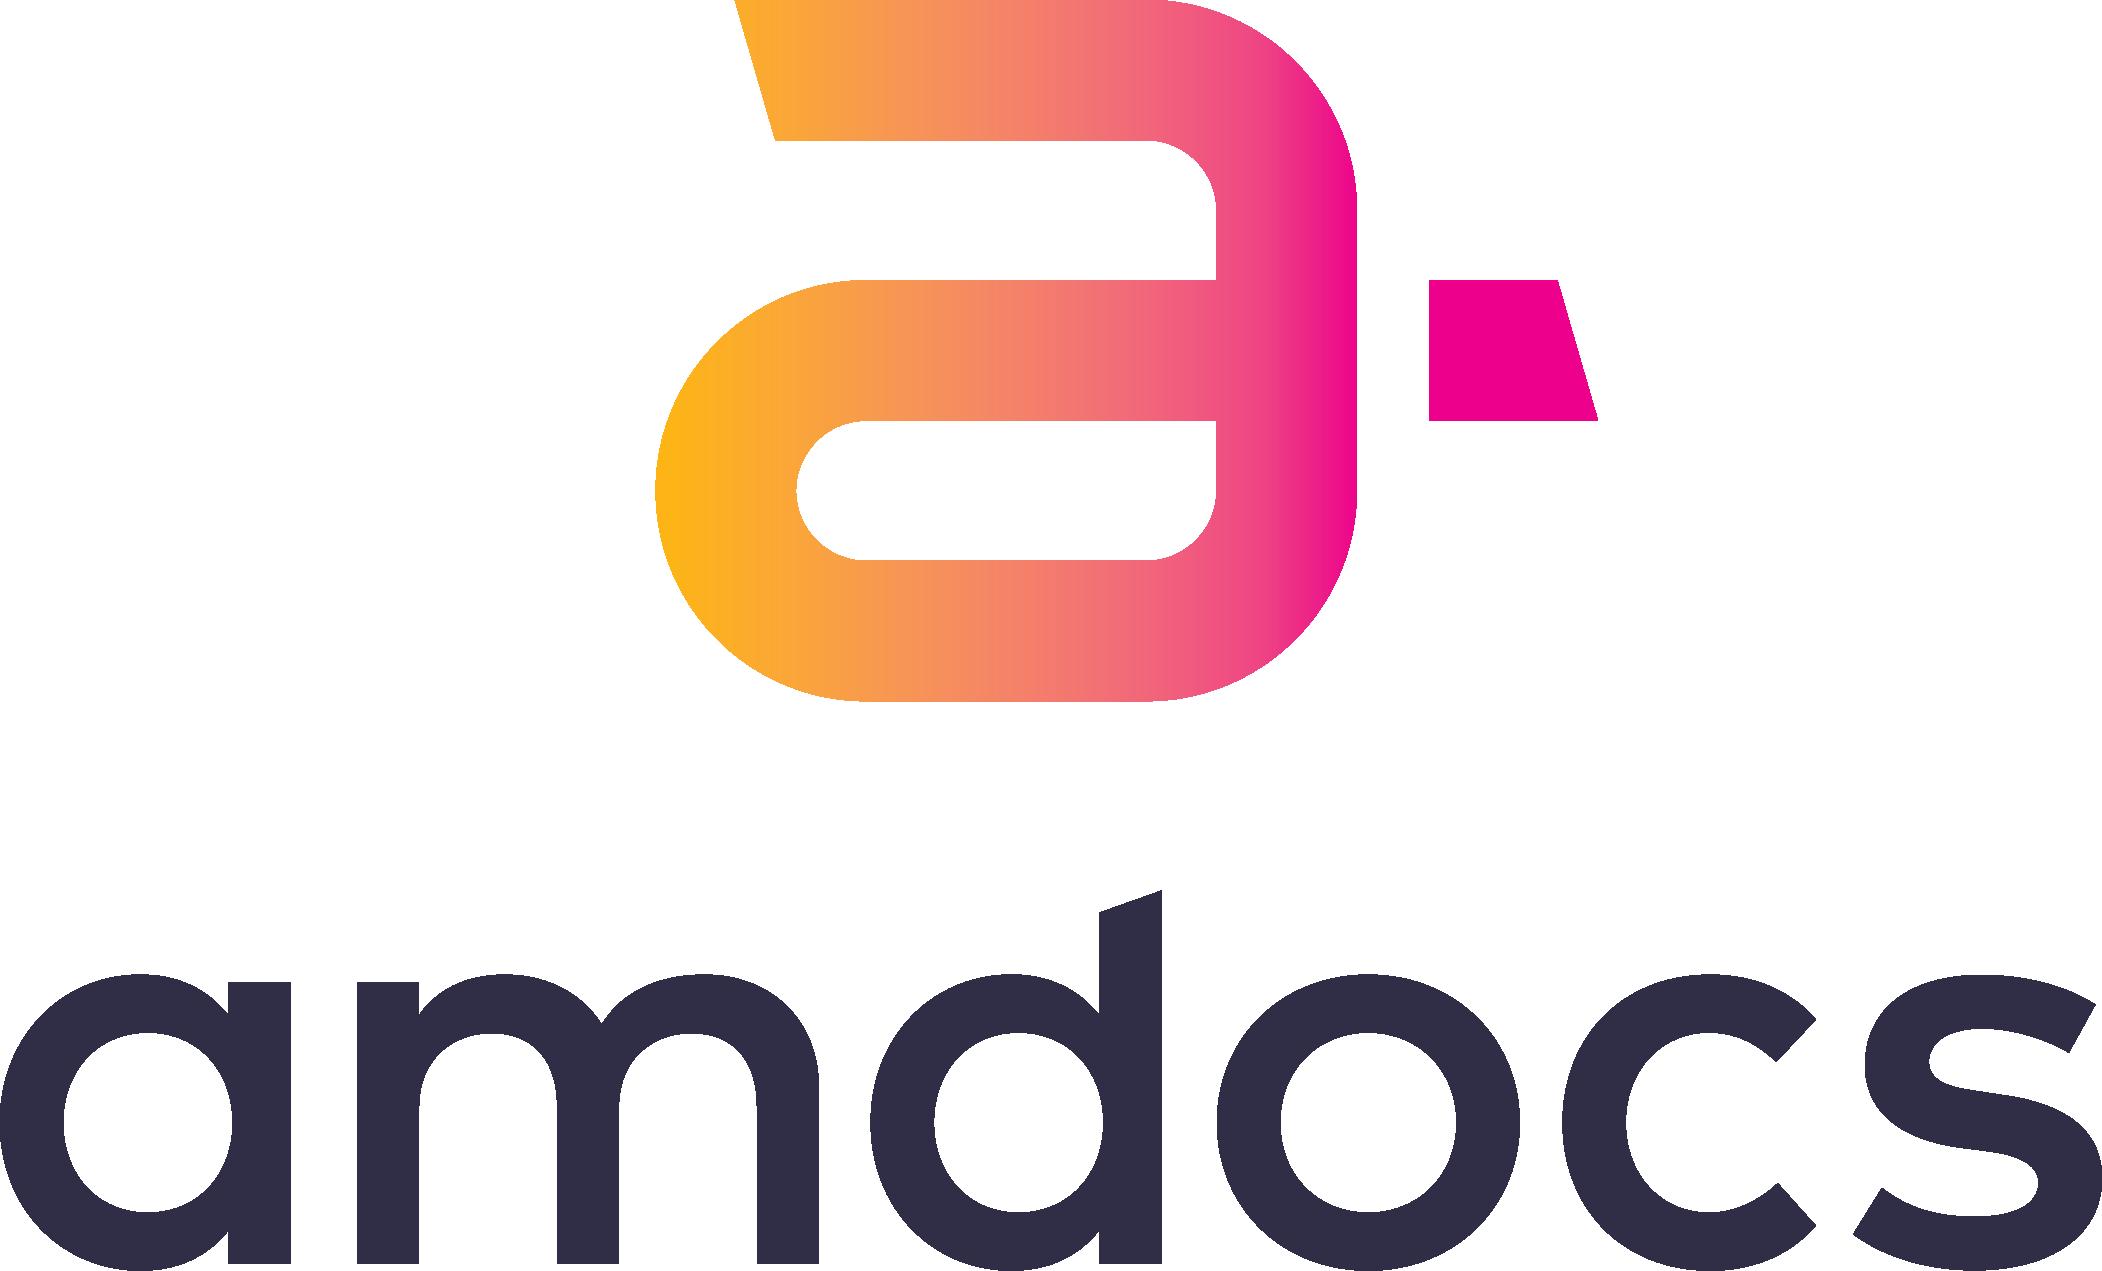 Amdocs Ltd